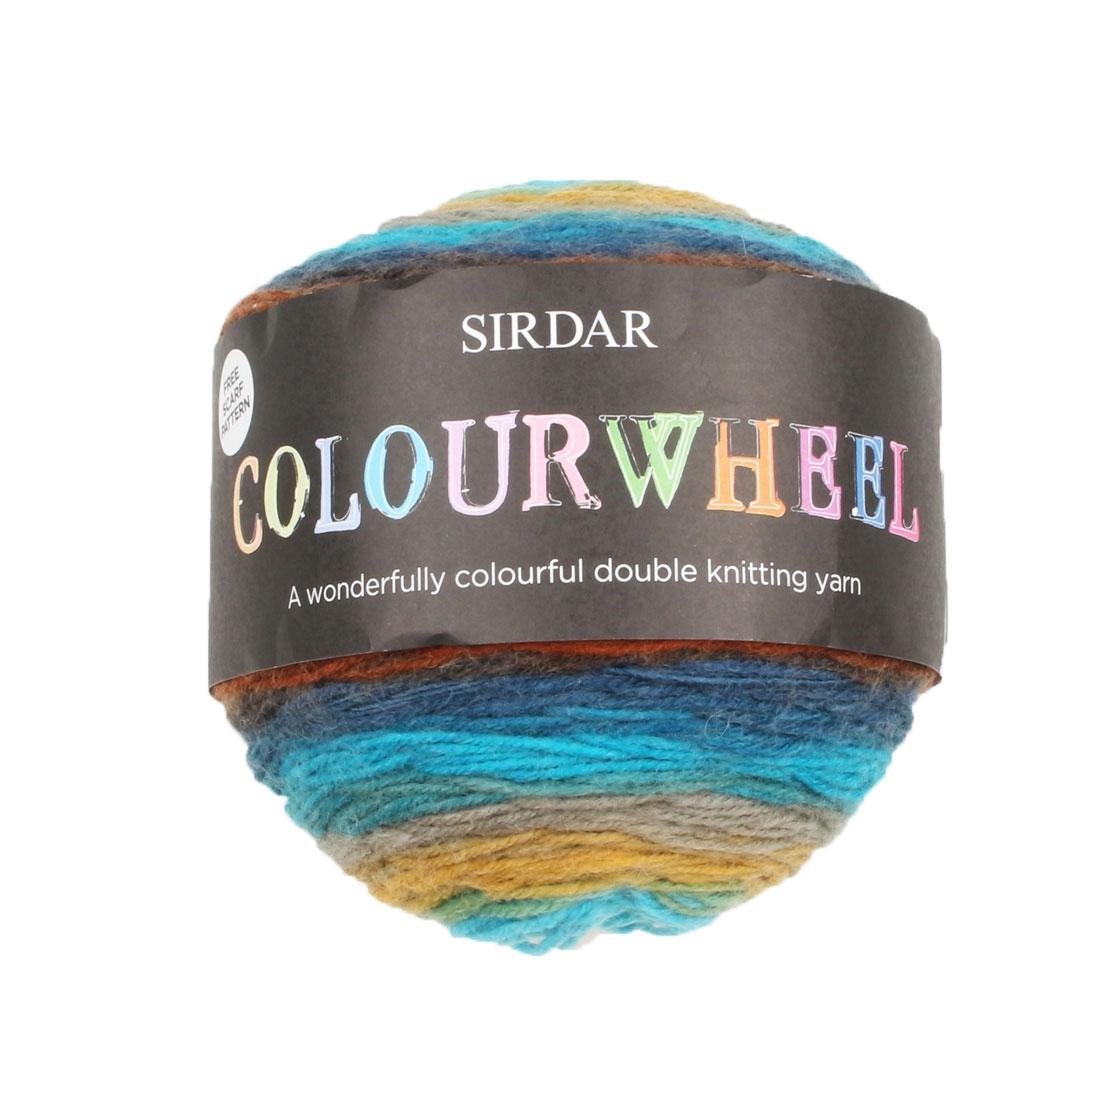 Sirdar Colourwheel Dk 208